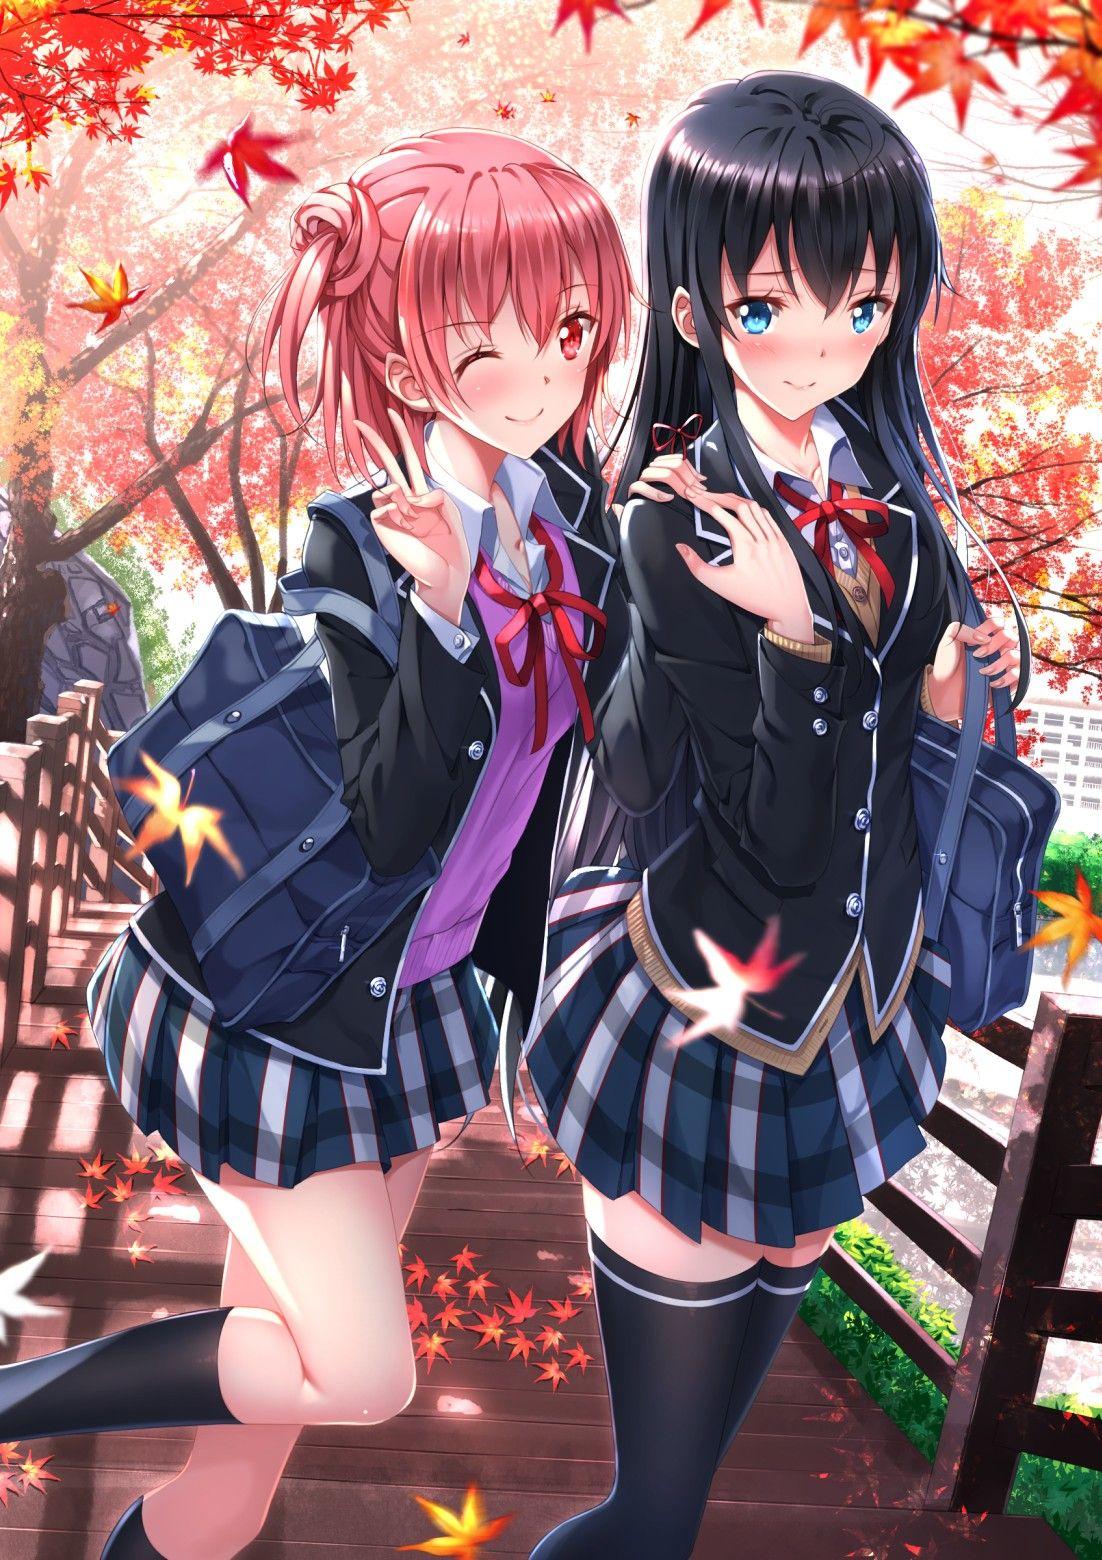 Yui x Yukino walking to school together trong 2019 Cô